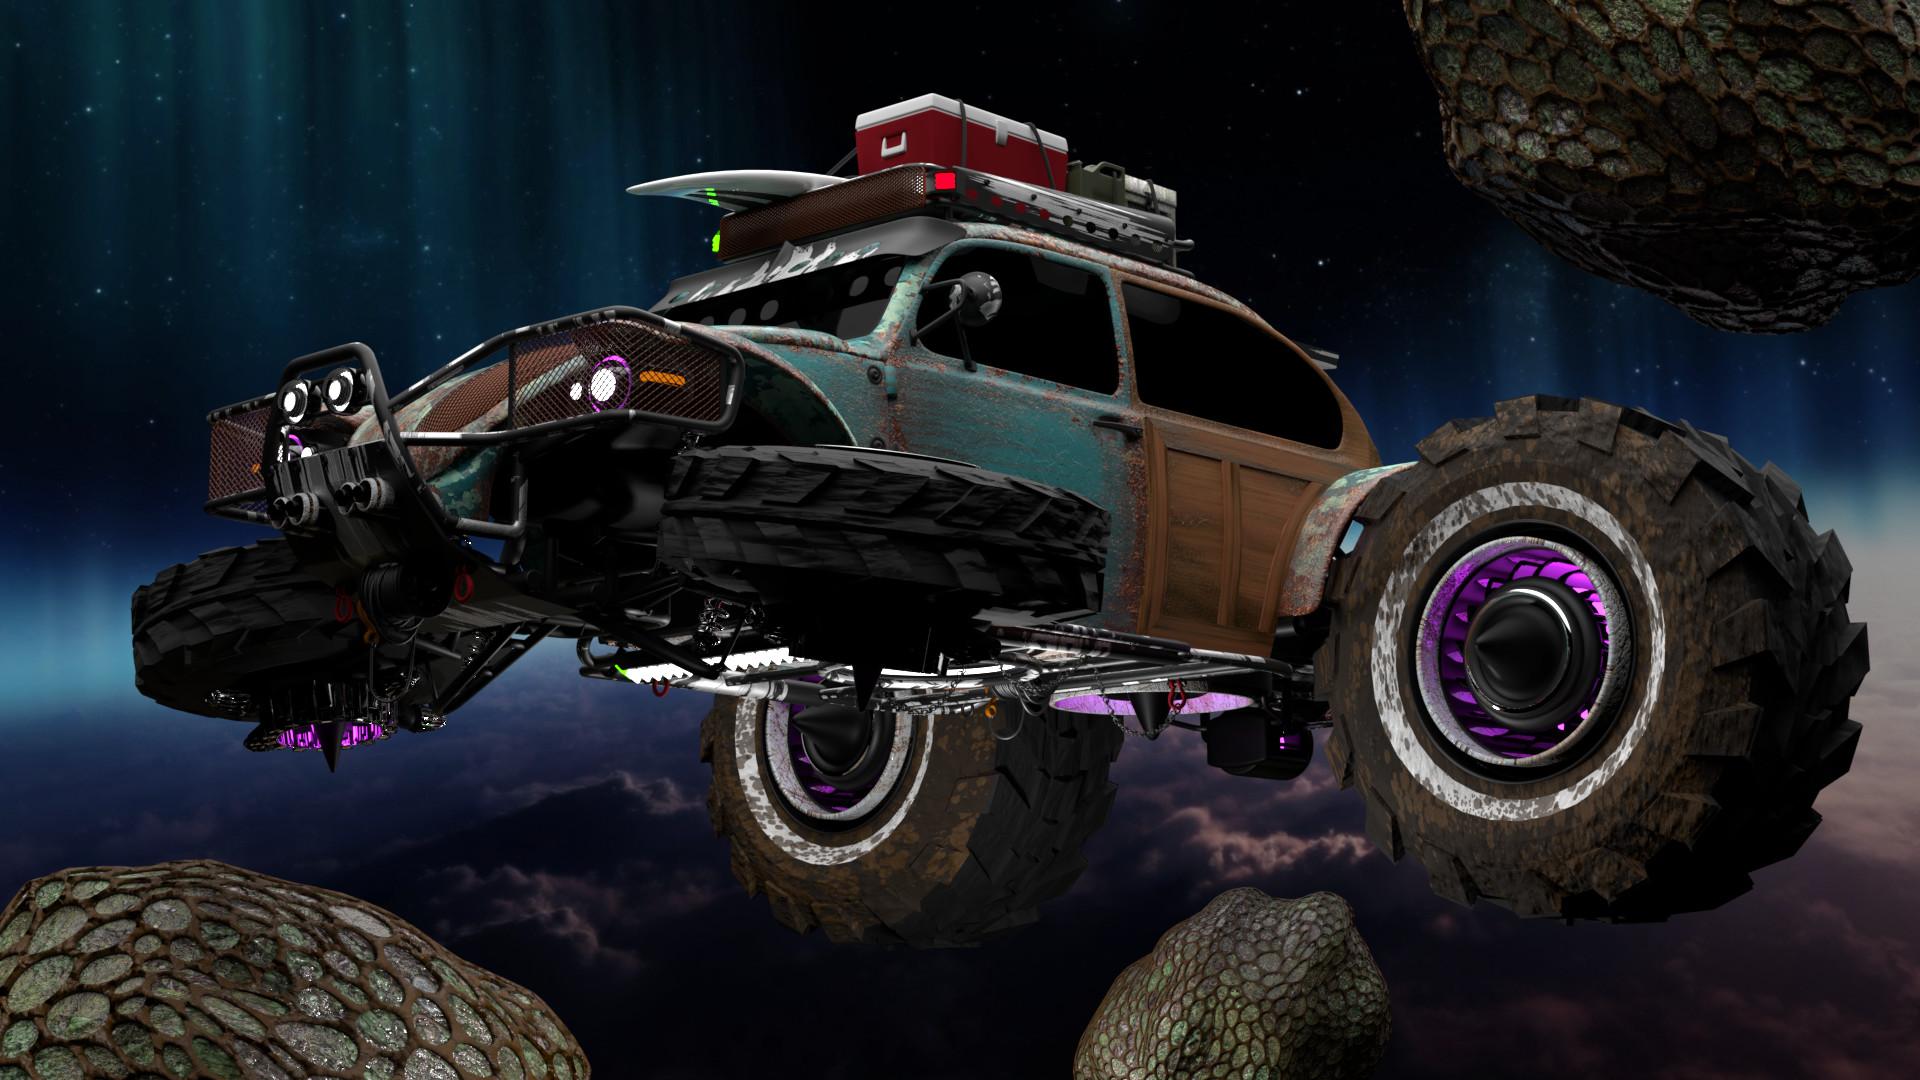 Baja Space Bug cruising asteroid belt